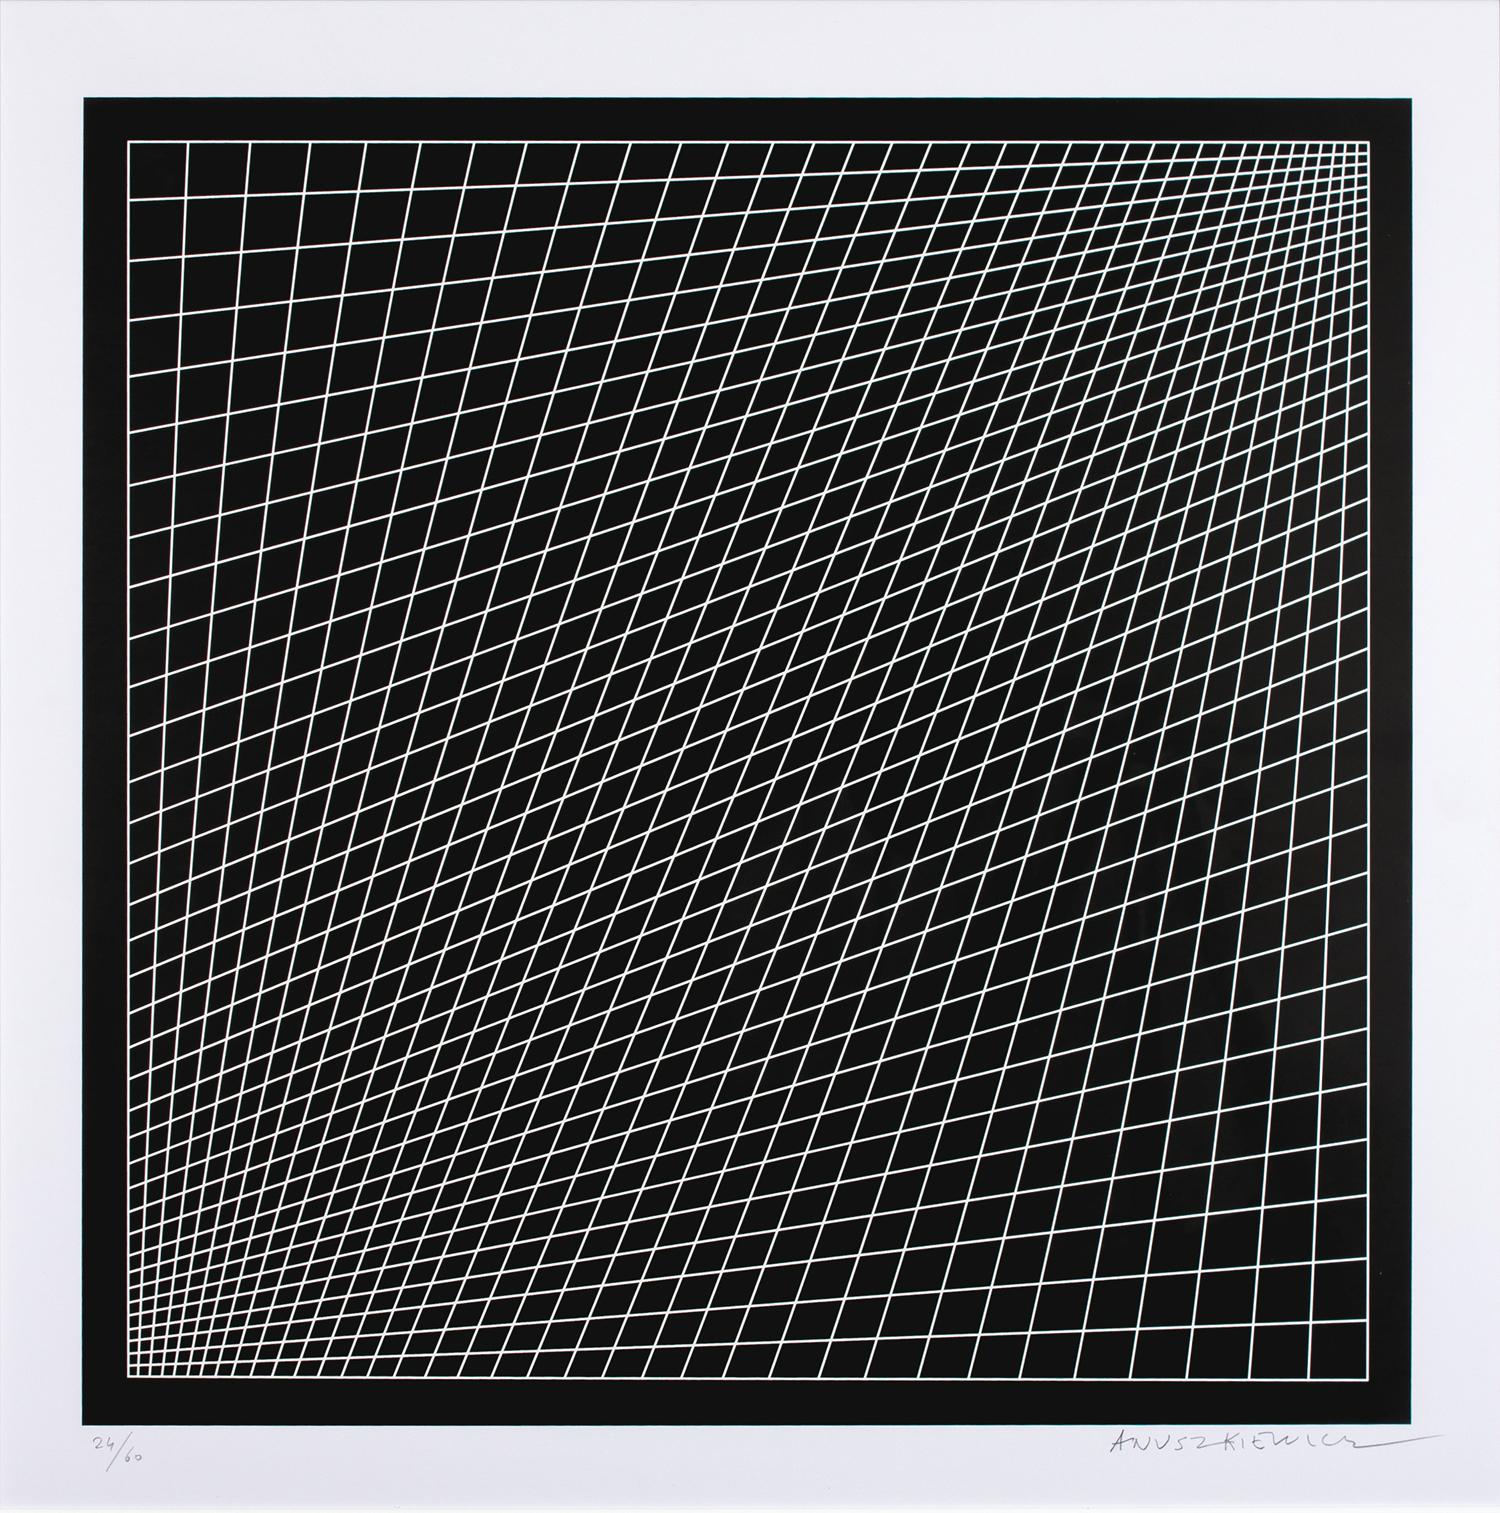 06_Richard Anuszkiewicz_70x70_Convex-concave_1966